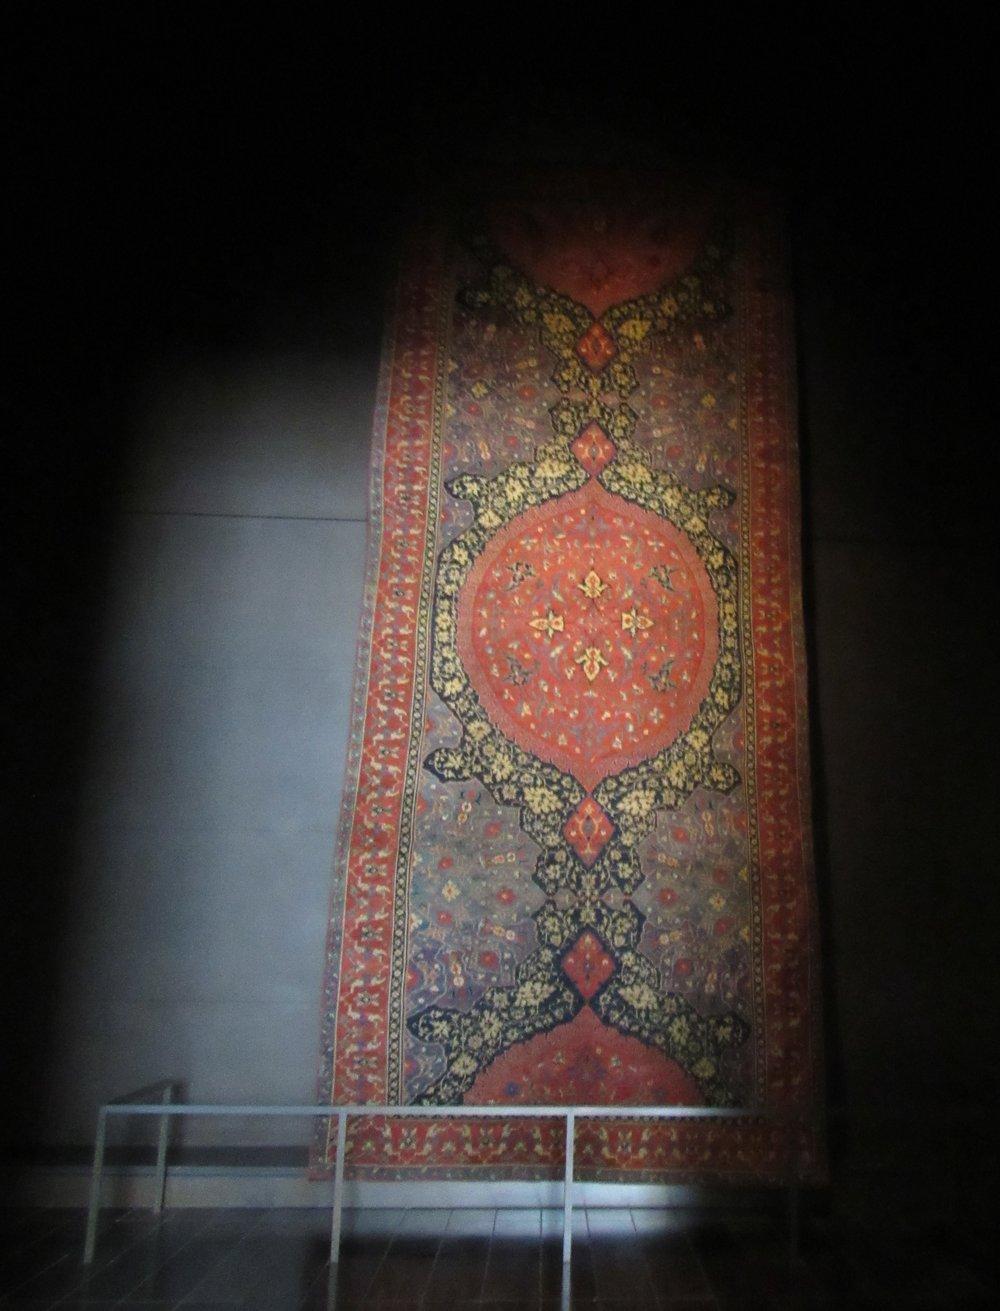 Oriental Rug Louvre Abu Dhabi © Flyga Twiga LLC